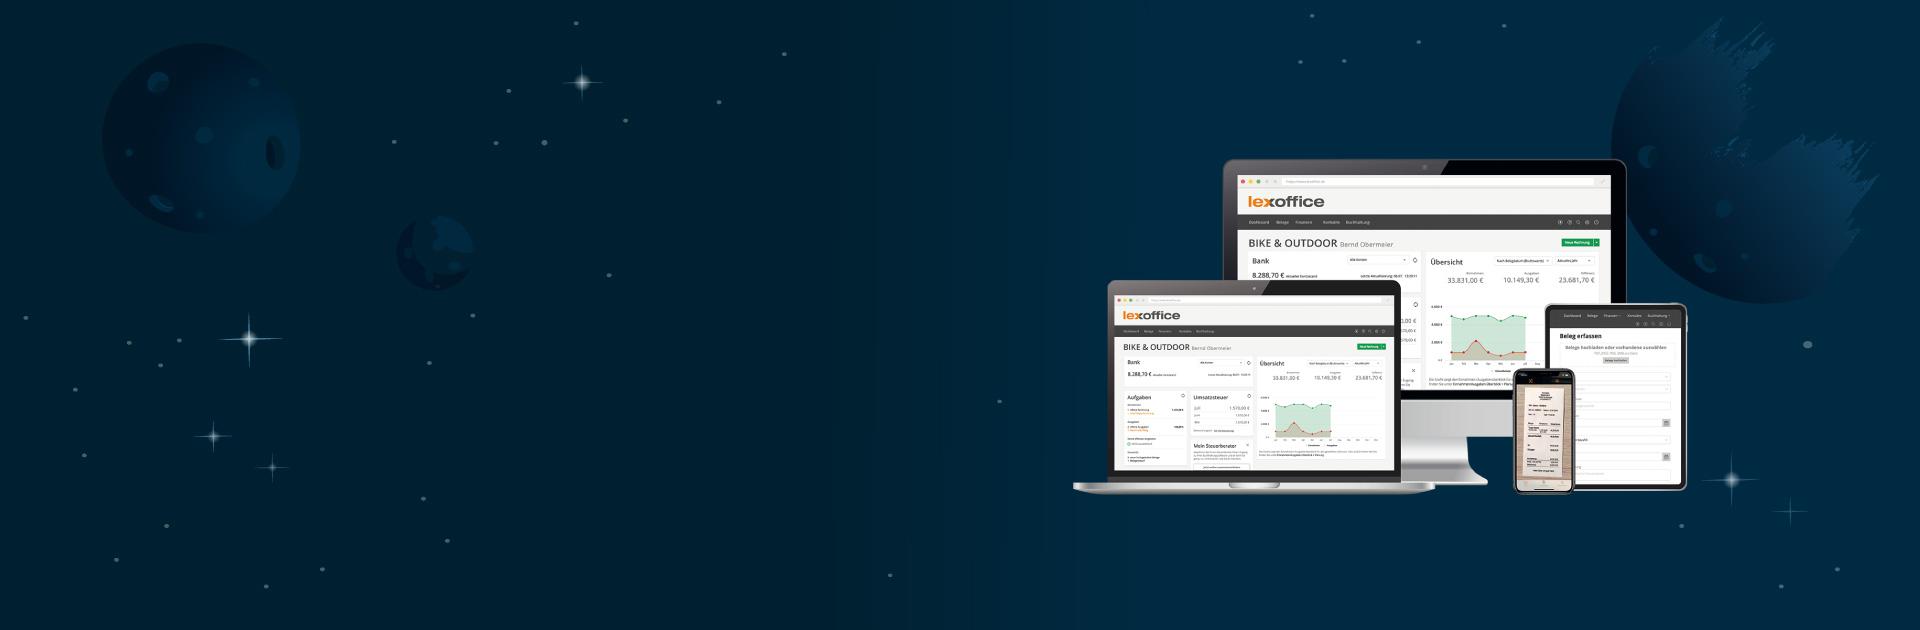 Illustration Abbildung der lexoffice Screens